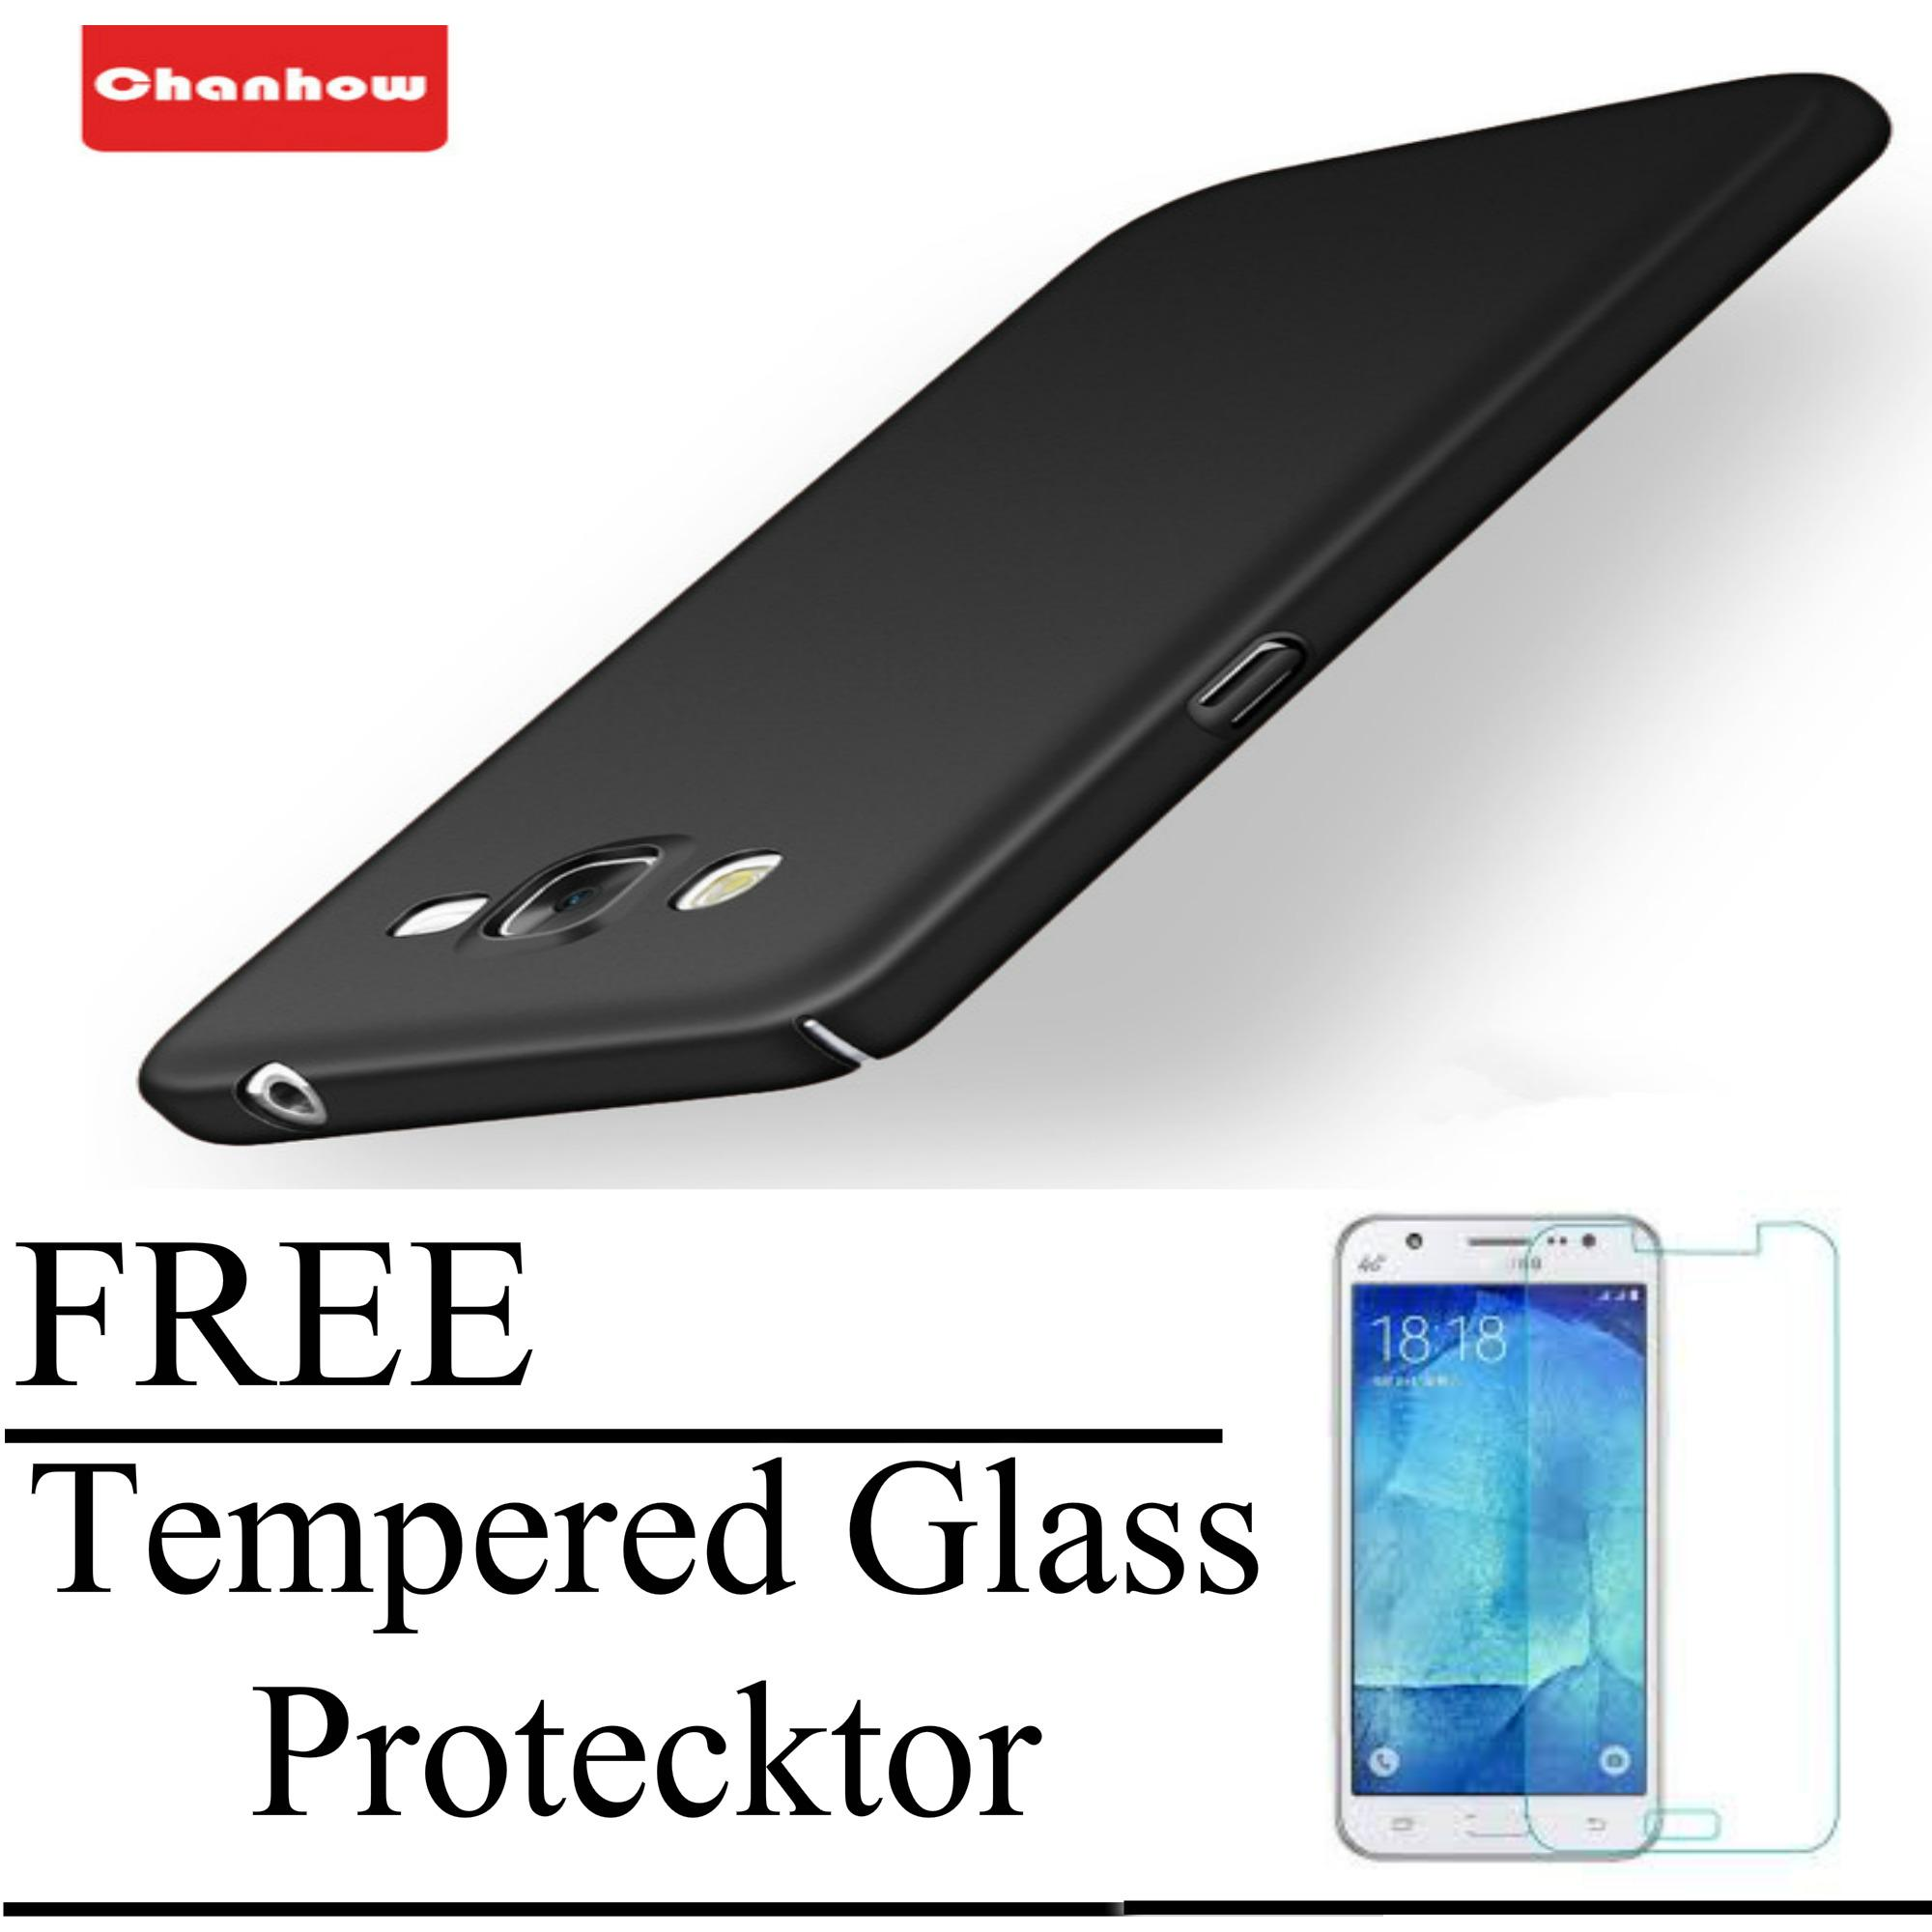 Kelebihan Hp 3g Android Murah Mirip Motion Samsung Galaxy J2 Terkini Hardcase Casing Cover Prime Free Tempered Glass Protecktor